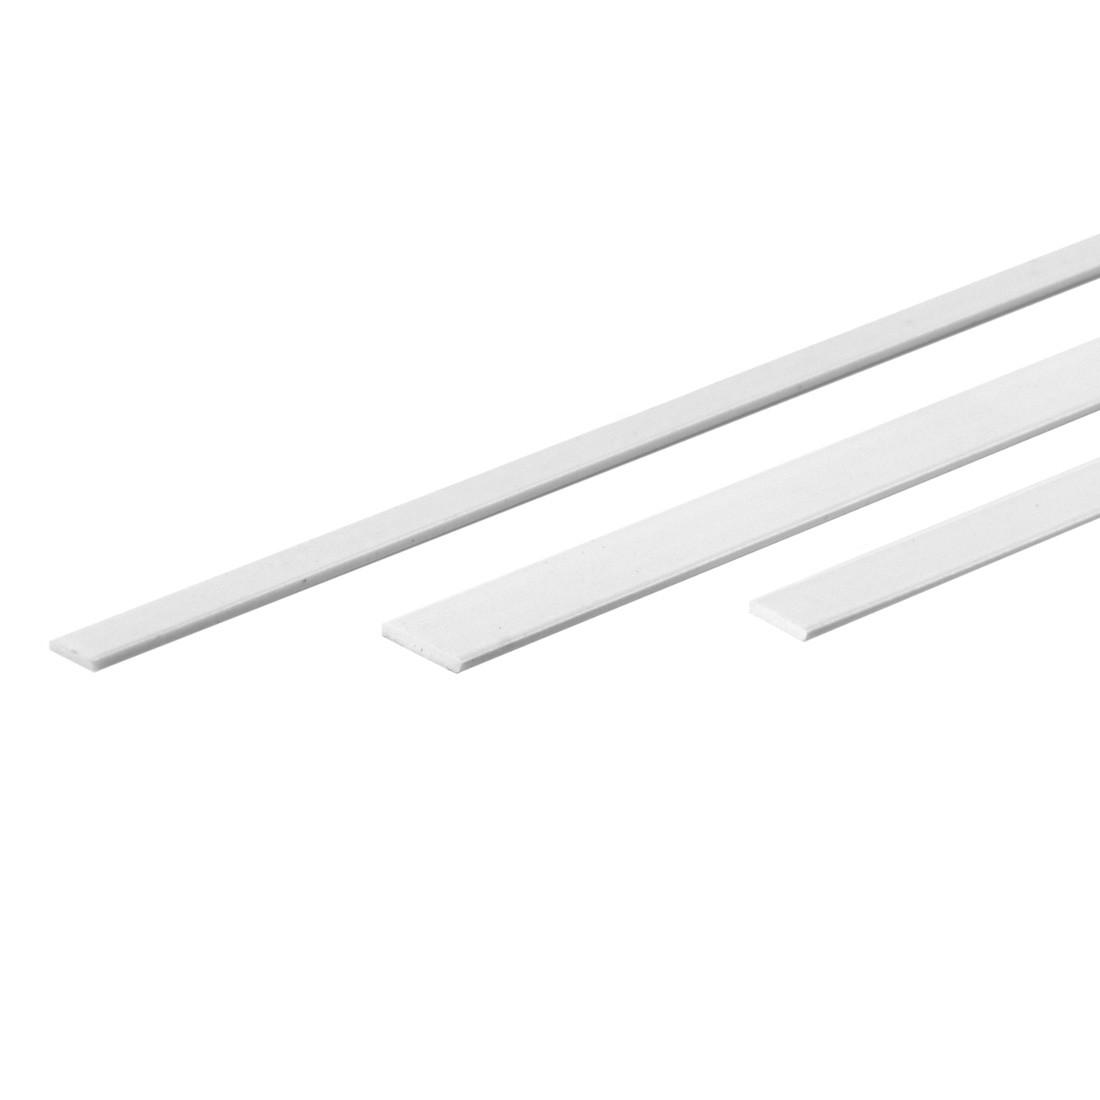 ASA rectangular profile mm.0,5x4x1000